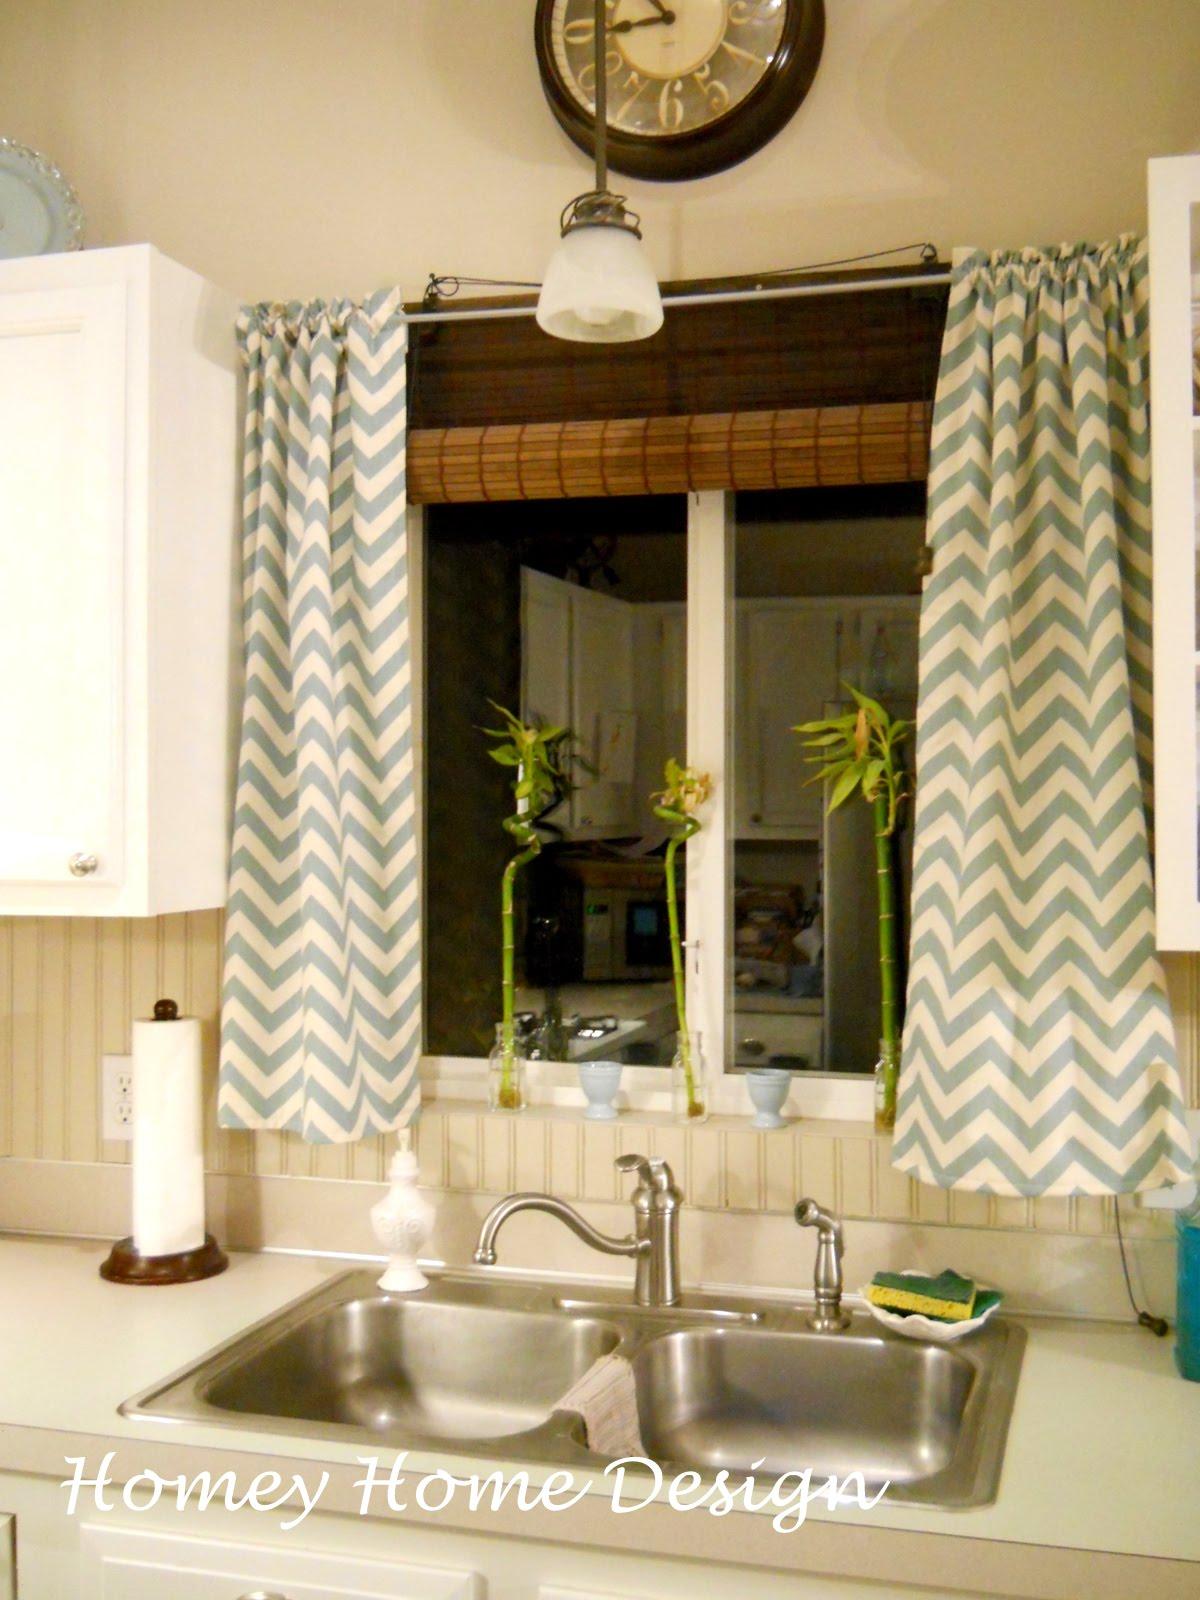 Yellow chevron kitchen curtains - Simple Chevron Curtains